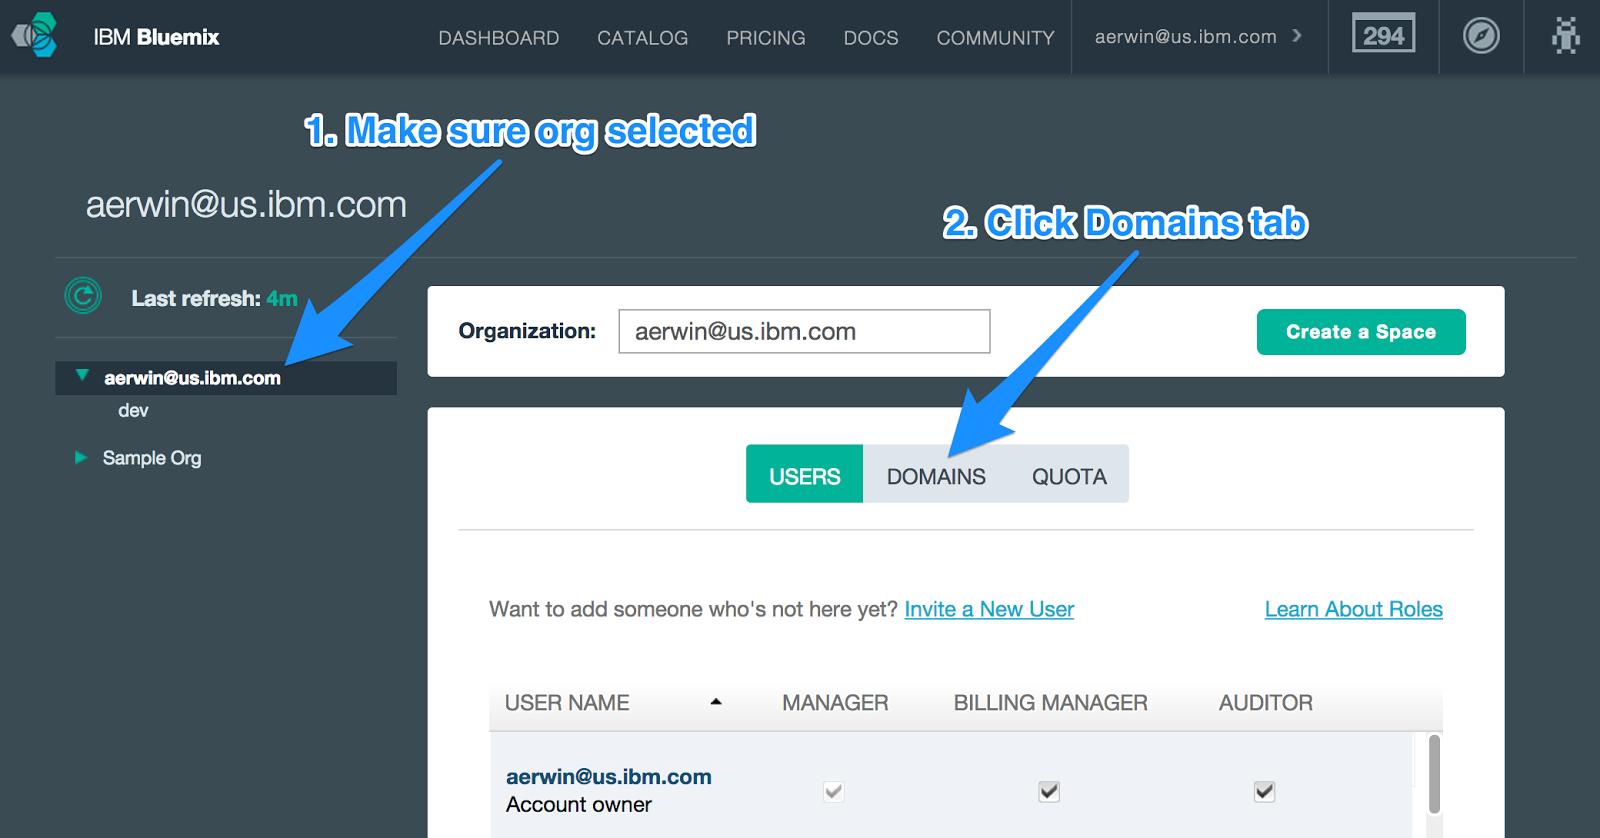 Bluemix UI: Manage Organizations Top-Level